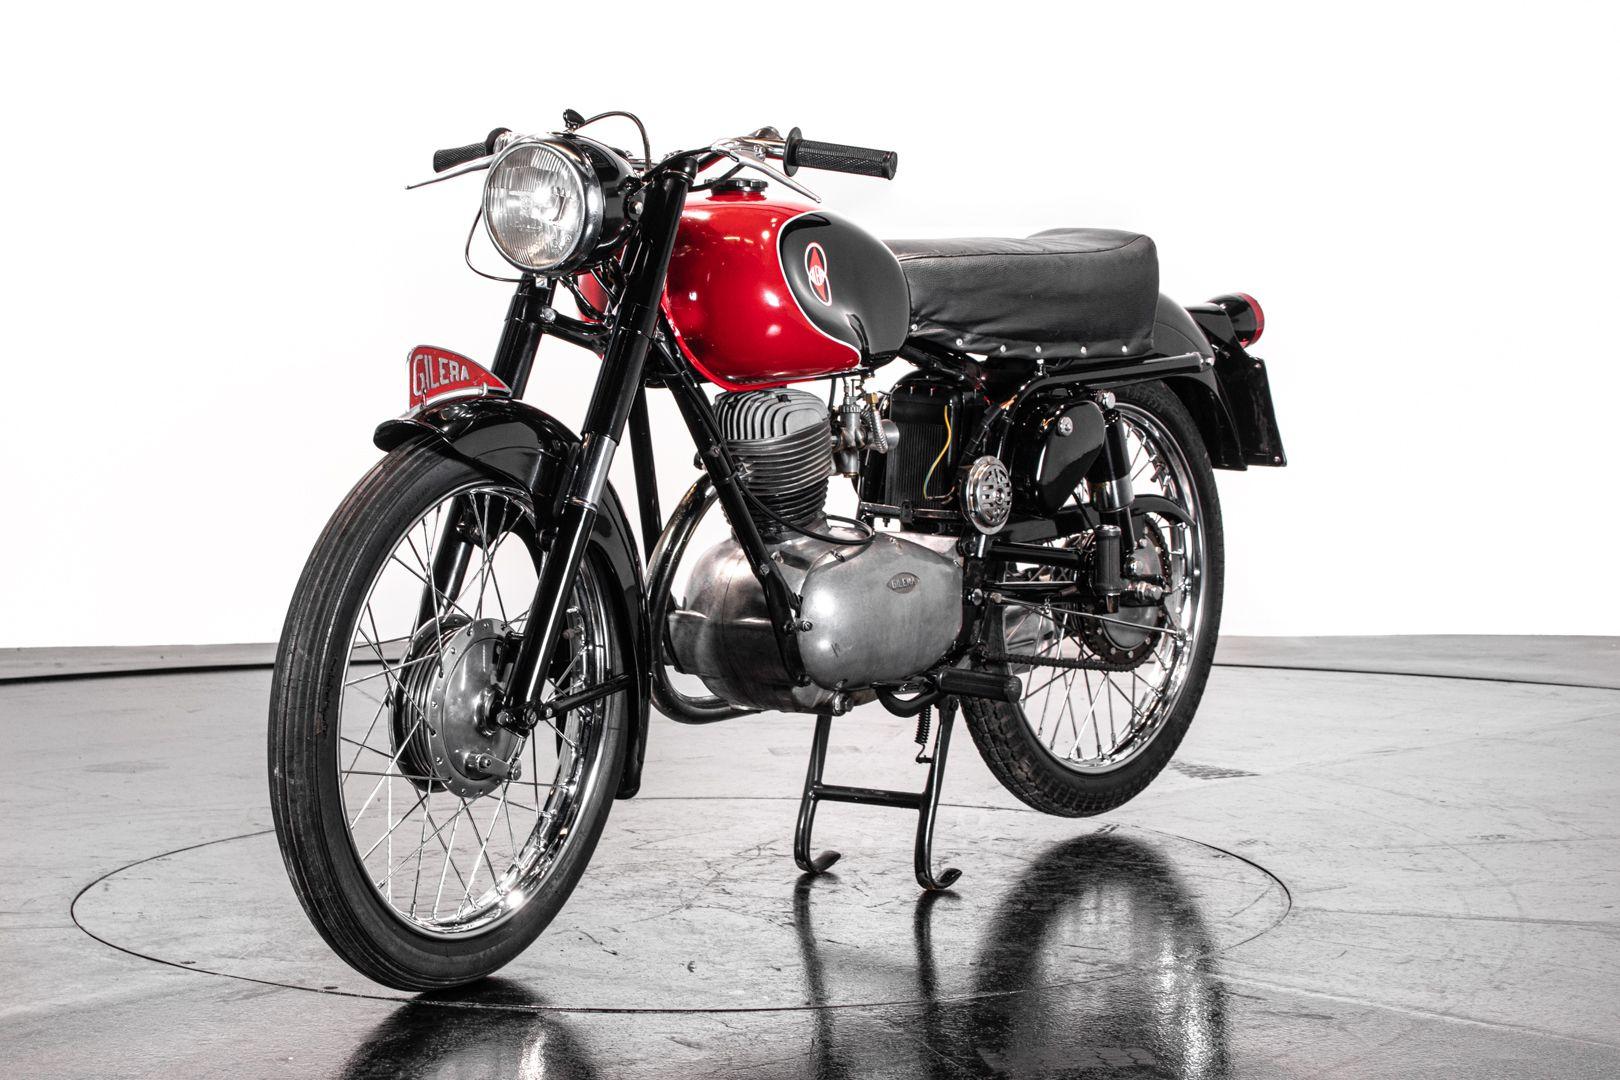 1960 Gilera 150 64015